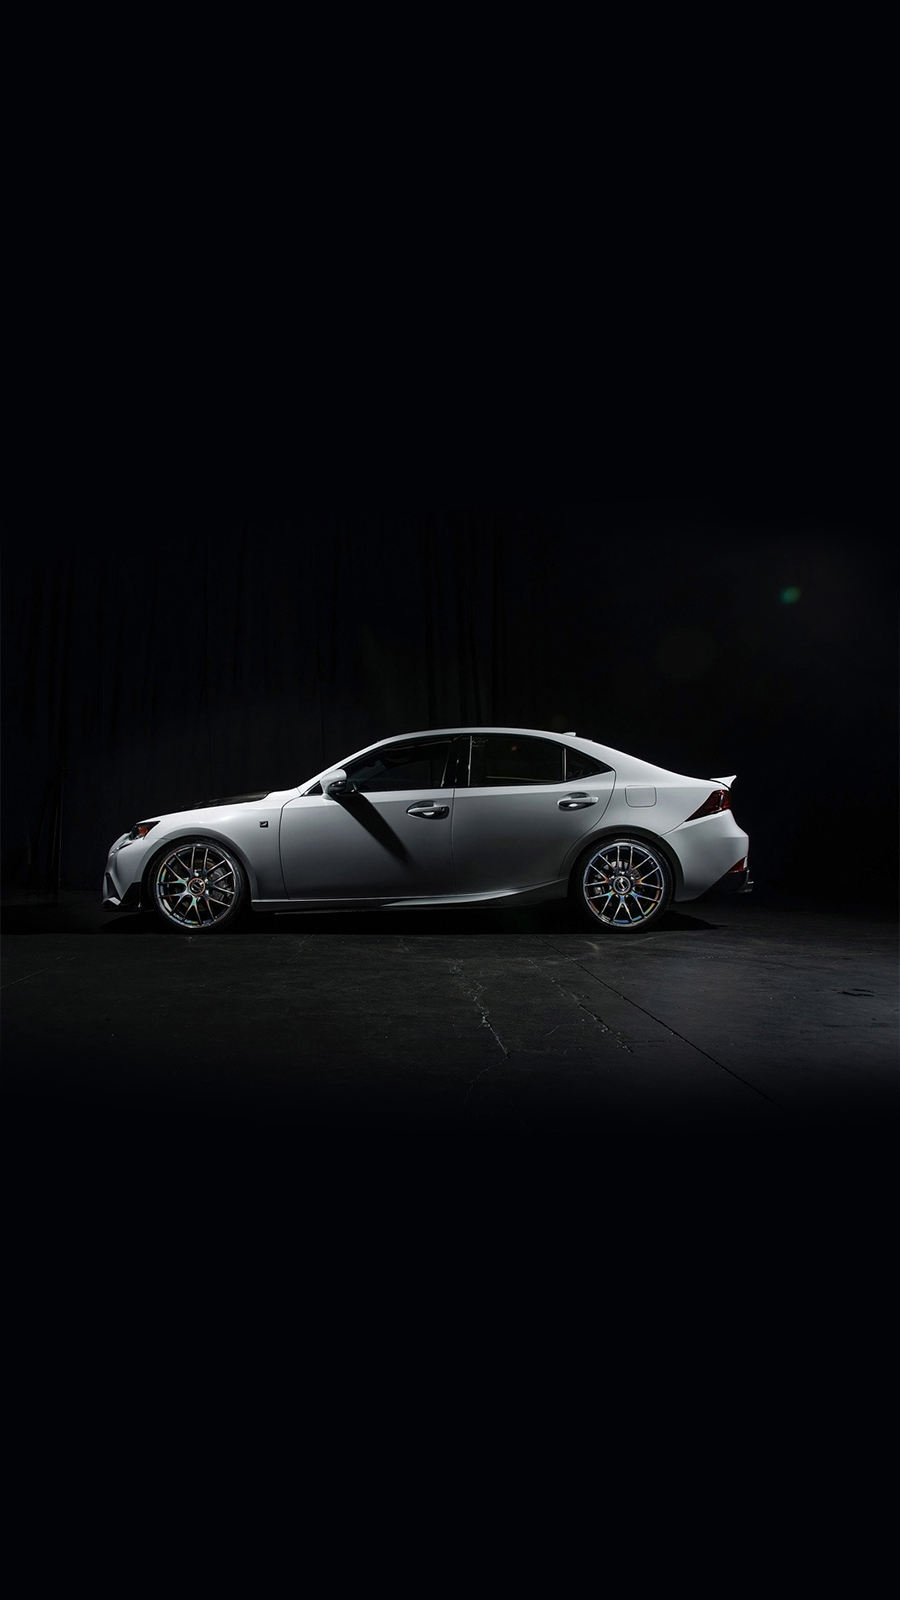 2014 Seibon Carbon Lexus 350 Best Wallpapers Free Download